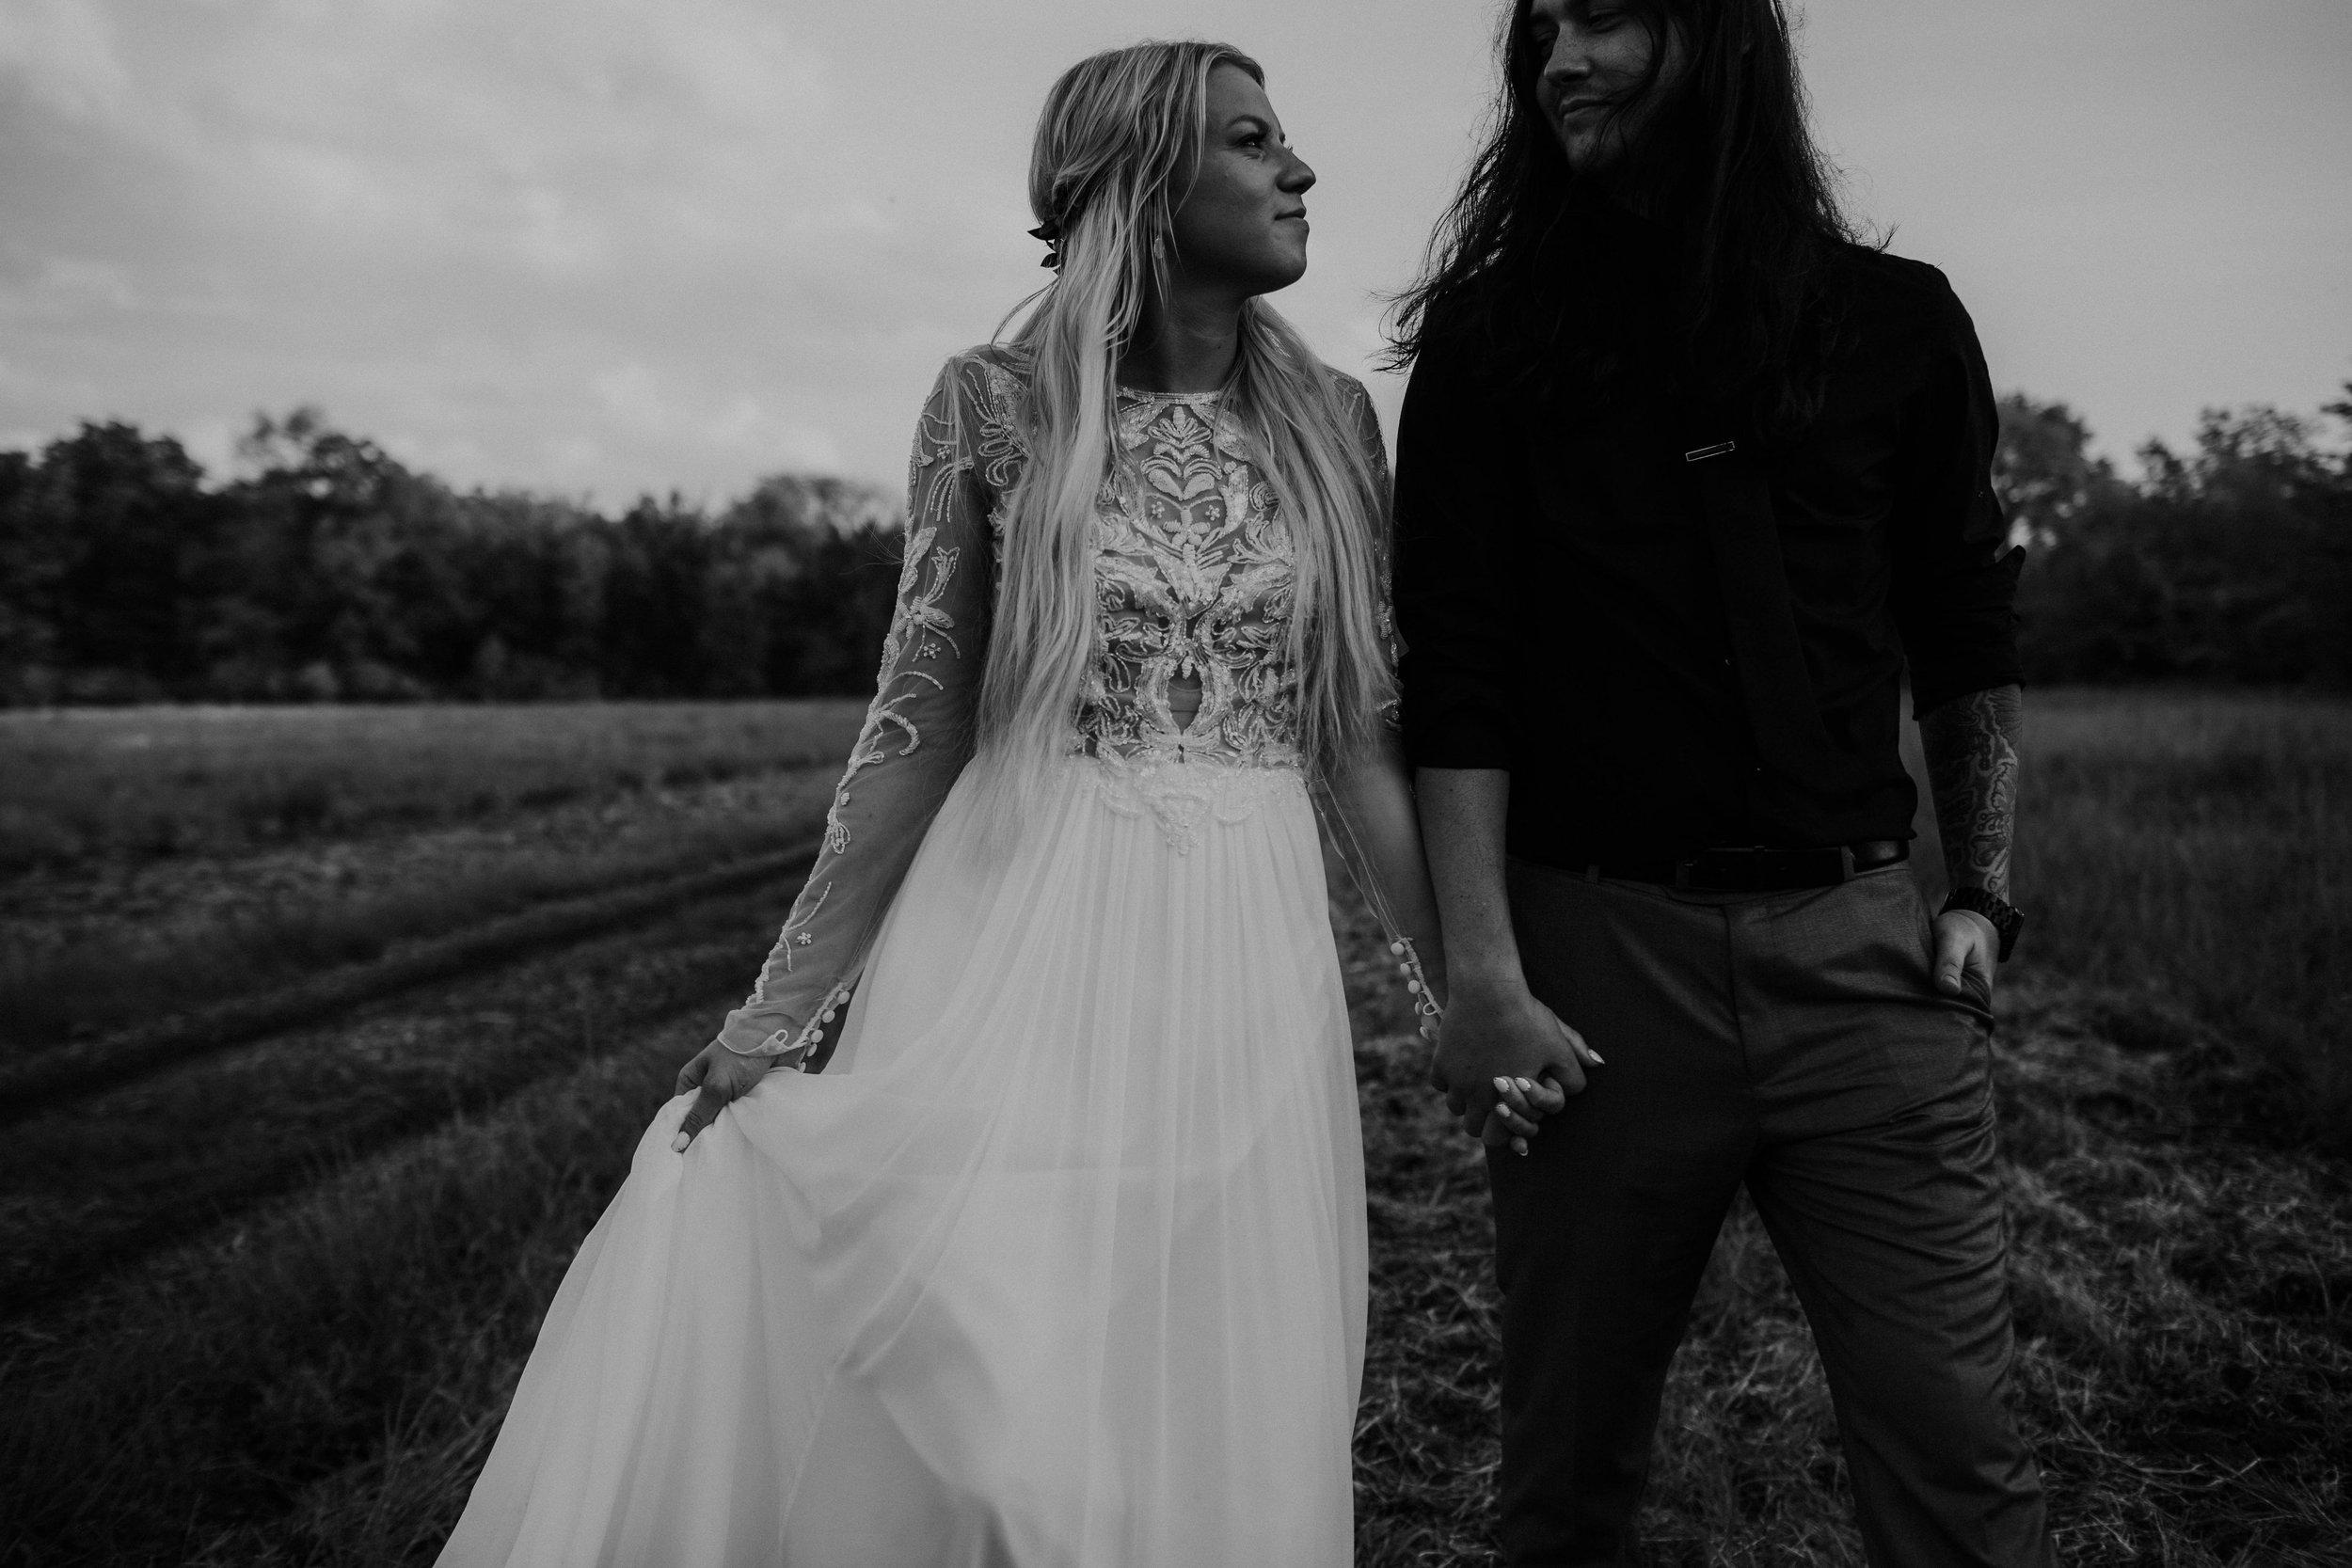 Columbus ohio wedding photographer canyon run ranch wedding grace e jones photography wedding photographer211.jpg